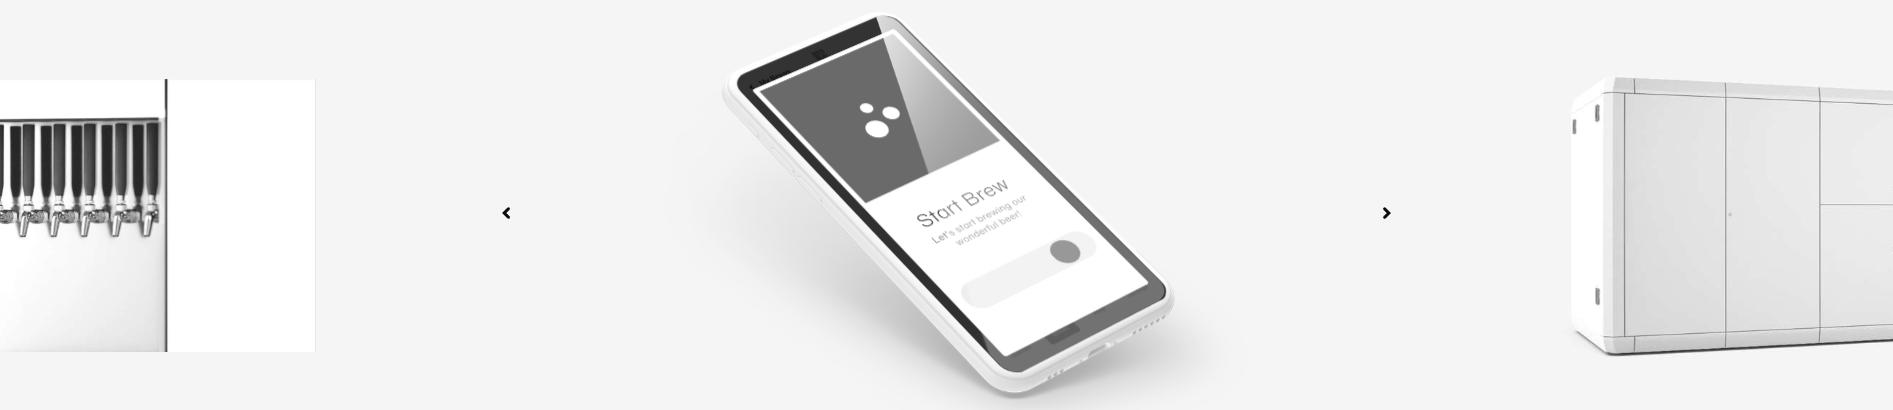 aplikacja mikrobrowar